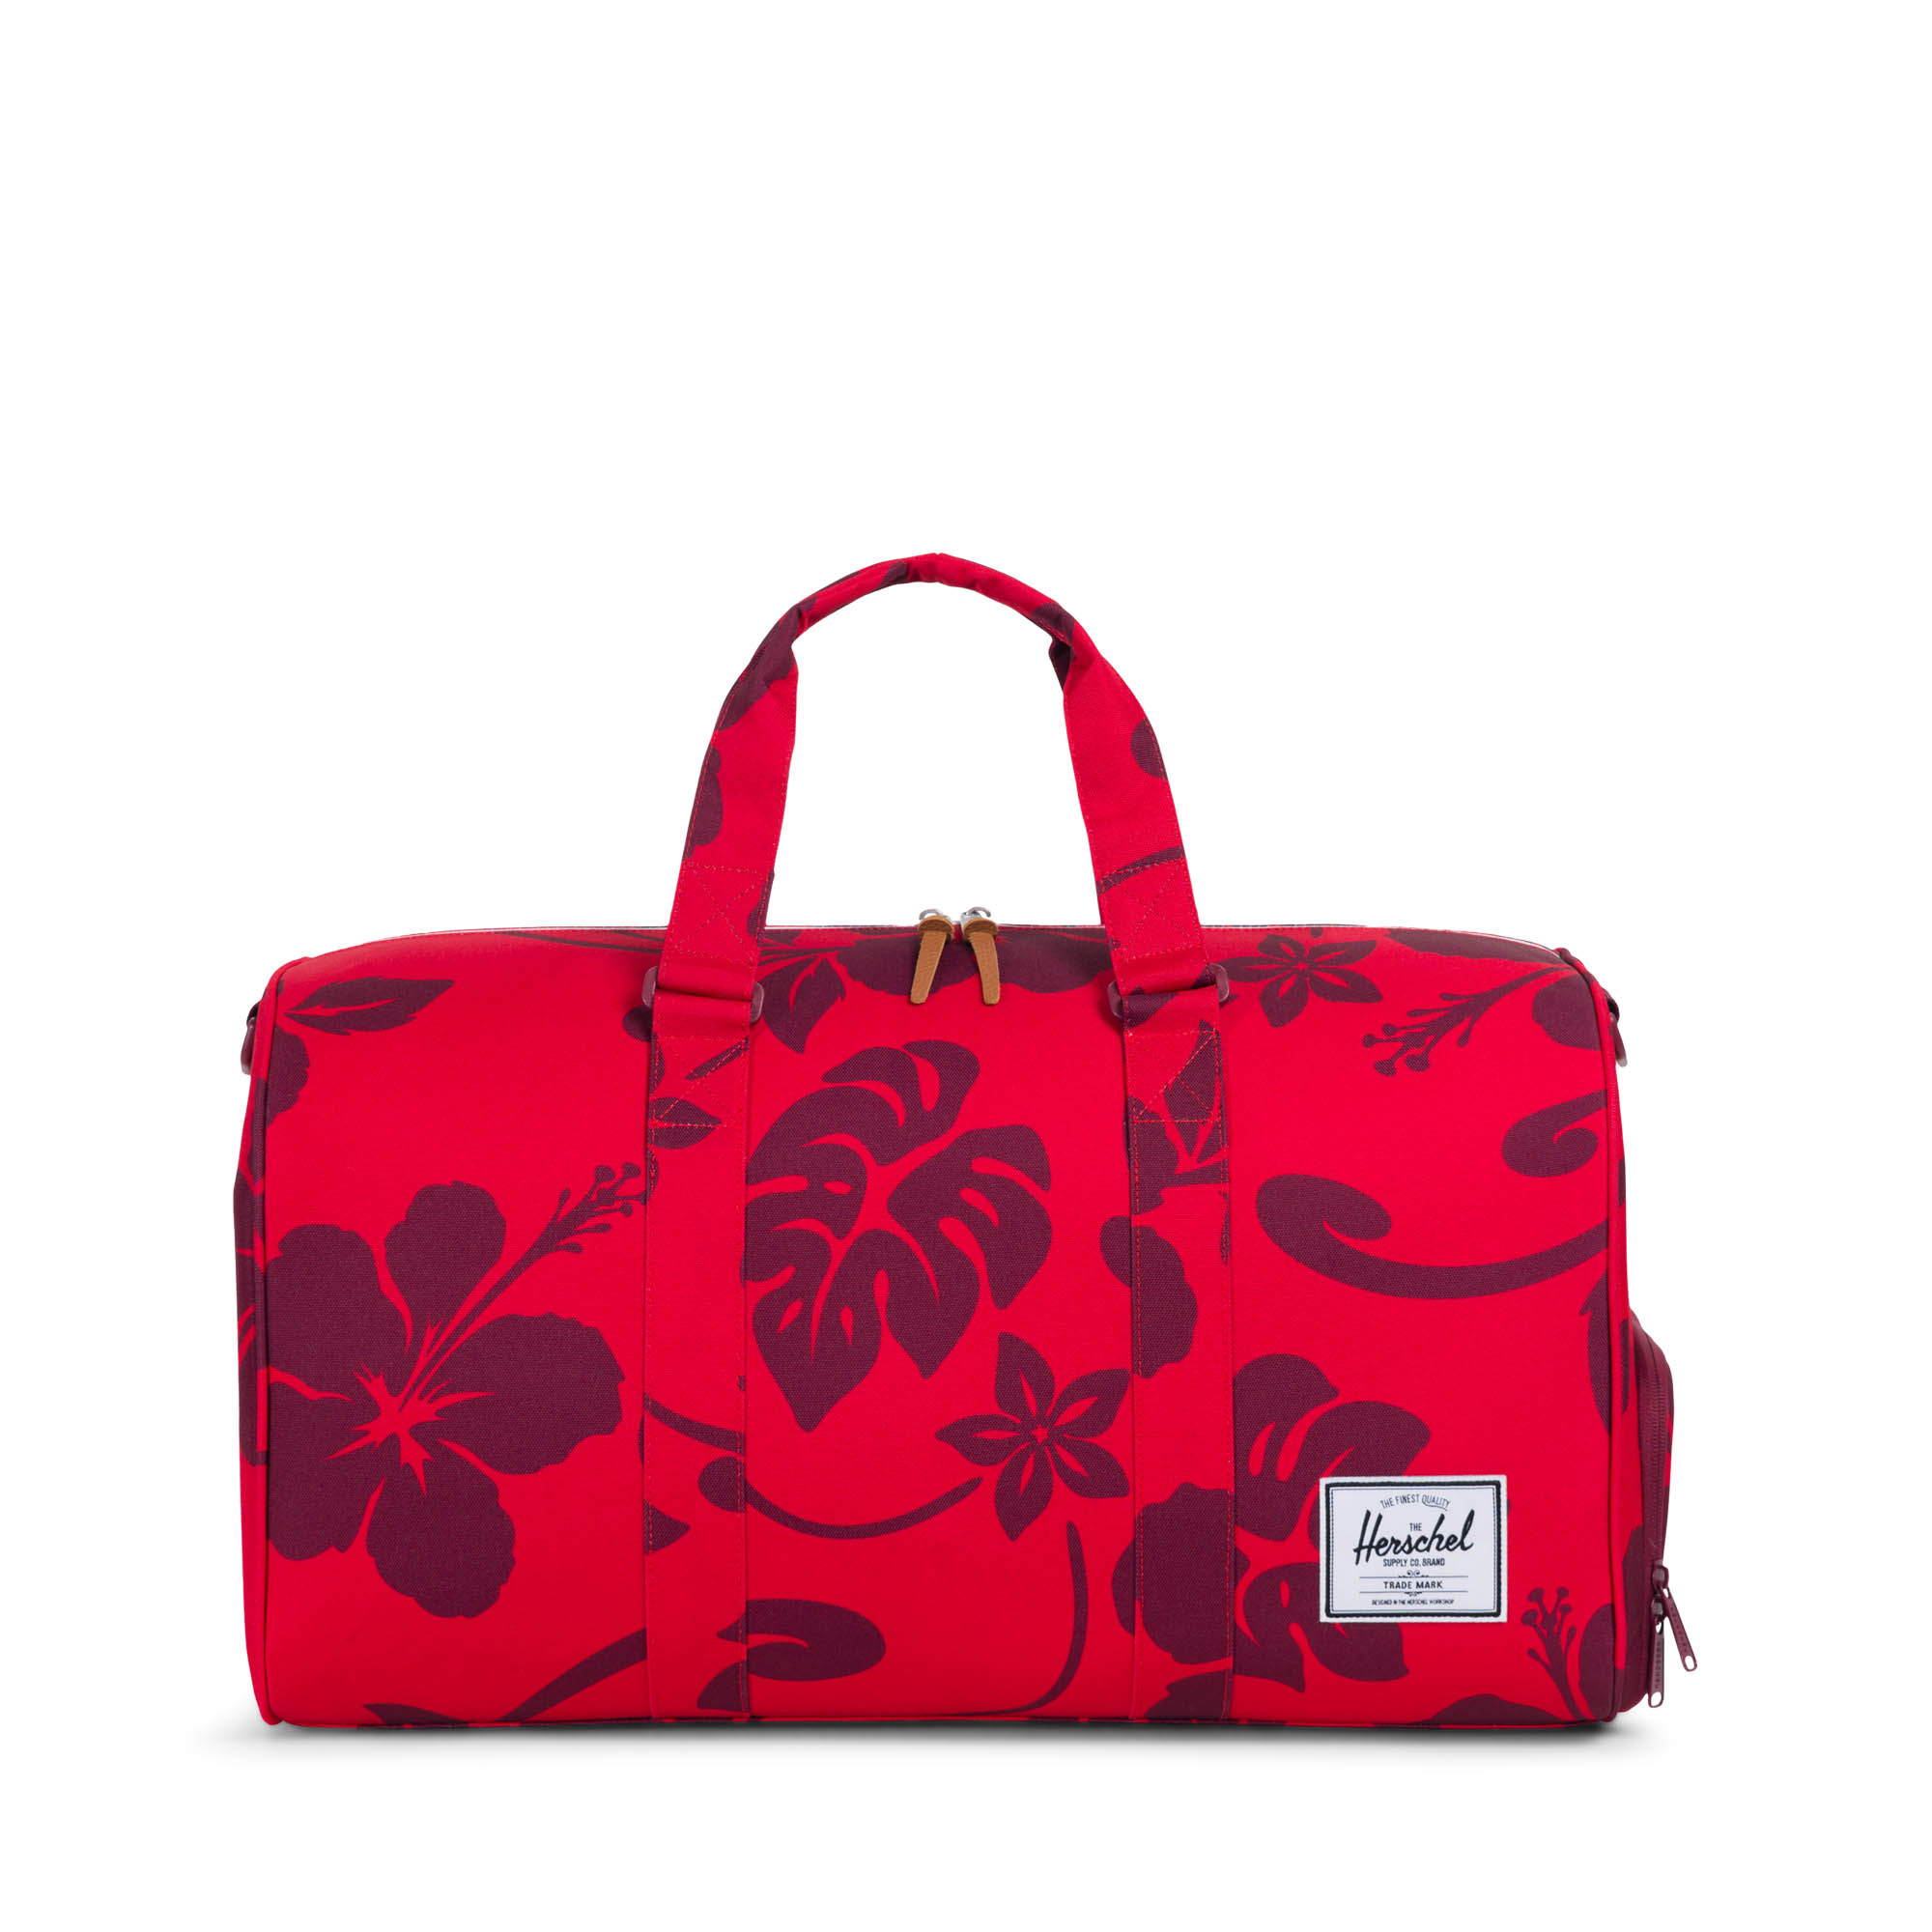 7bd1e107c092 Herschel Novel 42.5 Litre Duffle Shoulder Carry Bag Aloha. Our Price  £45.95